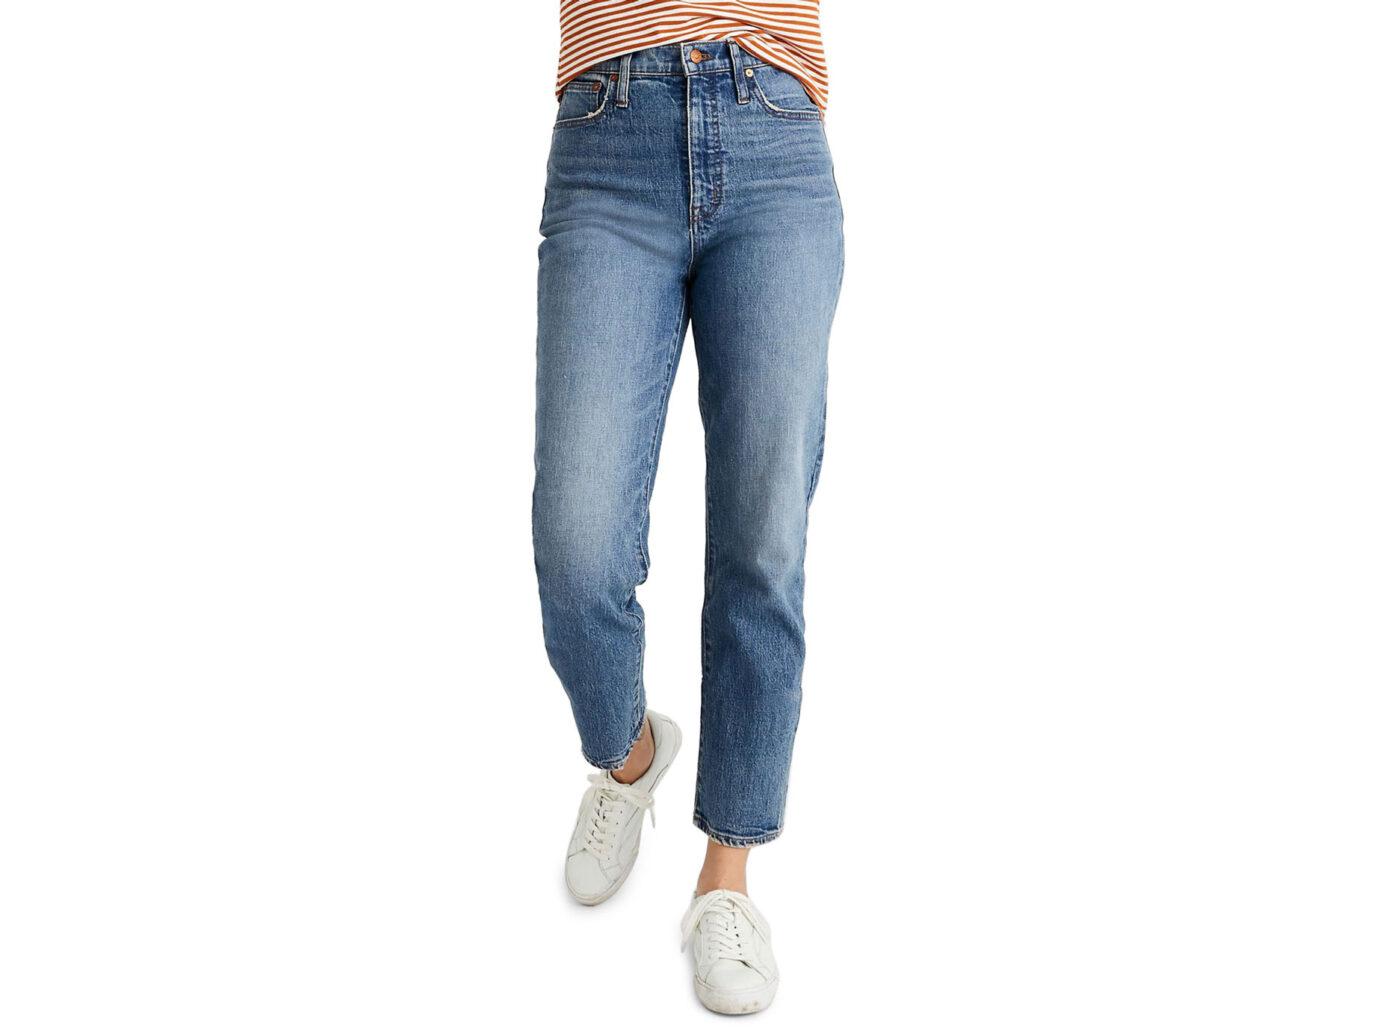 Madewell Classic Straight Leg Jeans